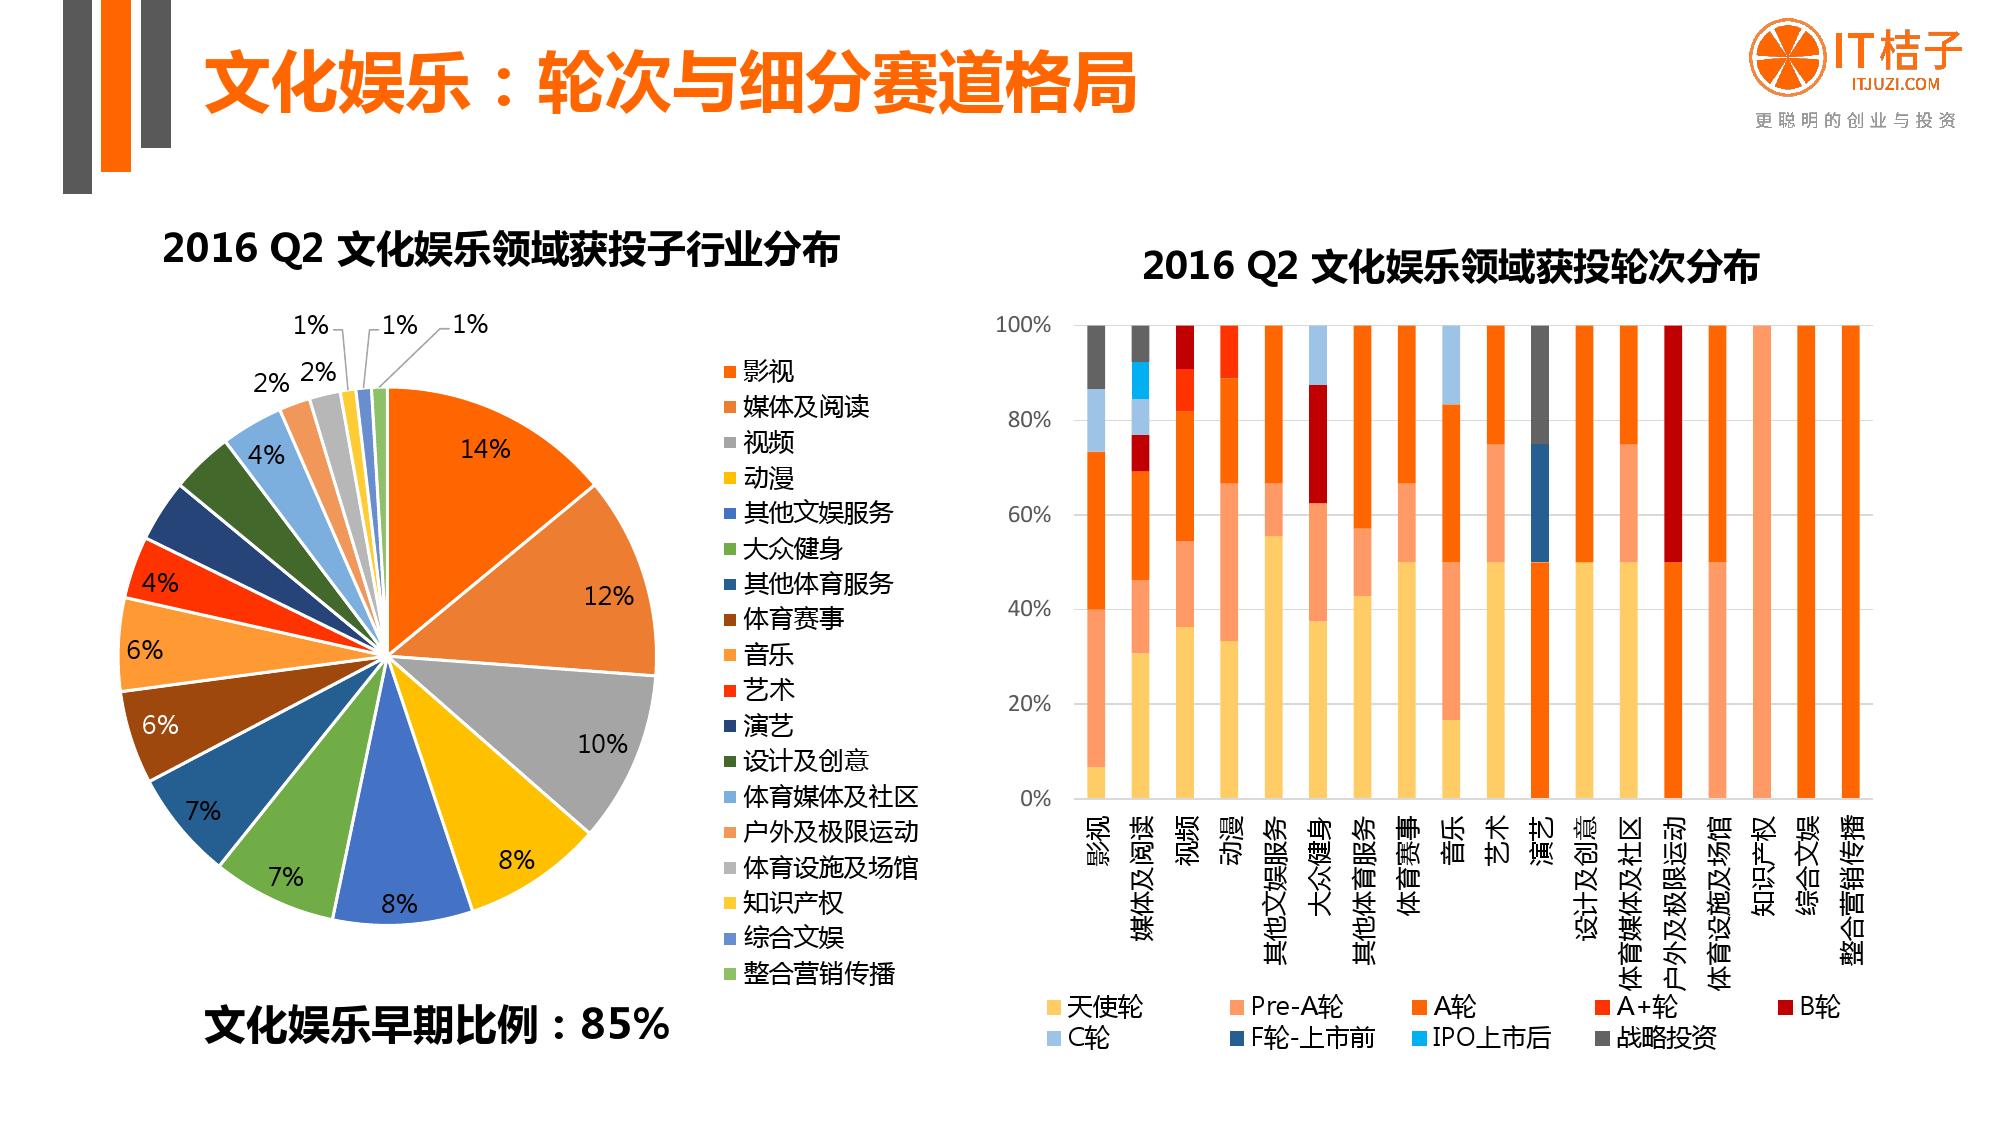 【IT桔子】2016年Q2中国互联网创业投资分析报告_000031